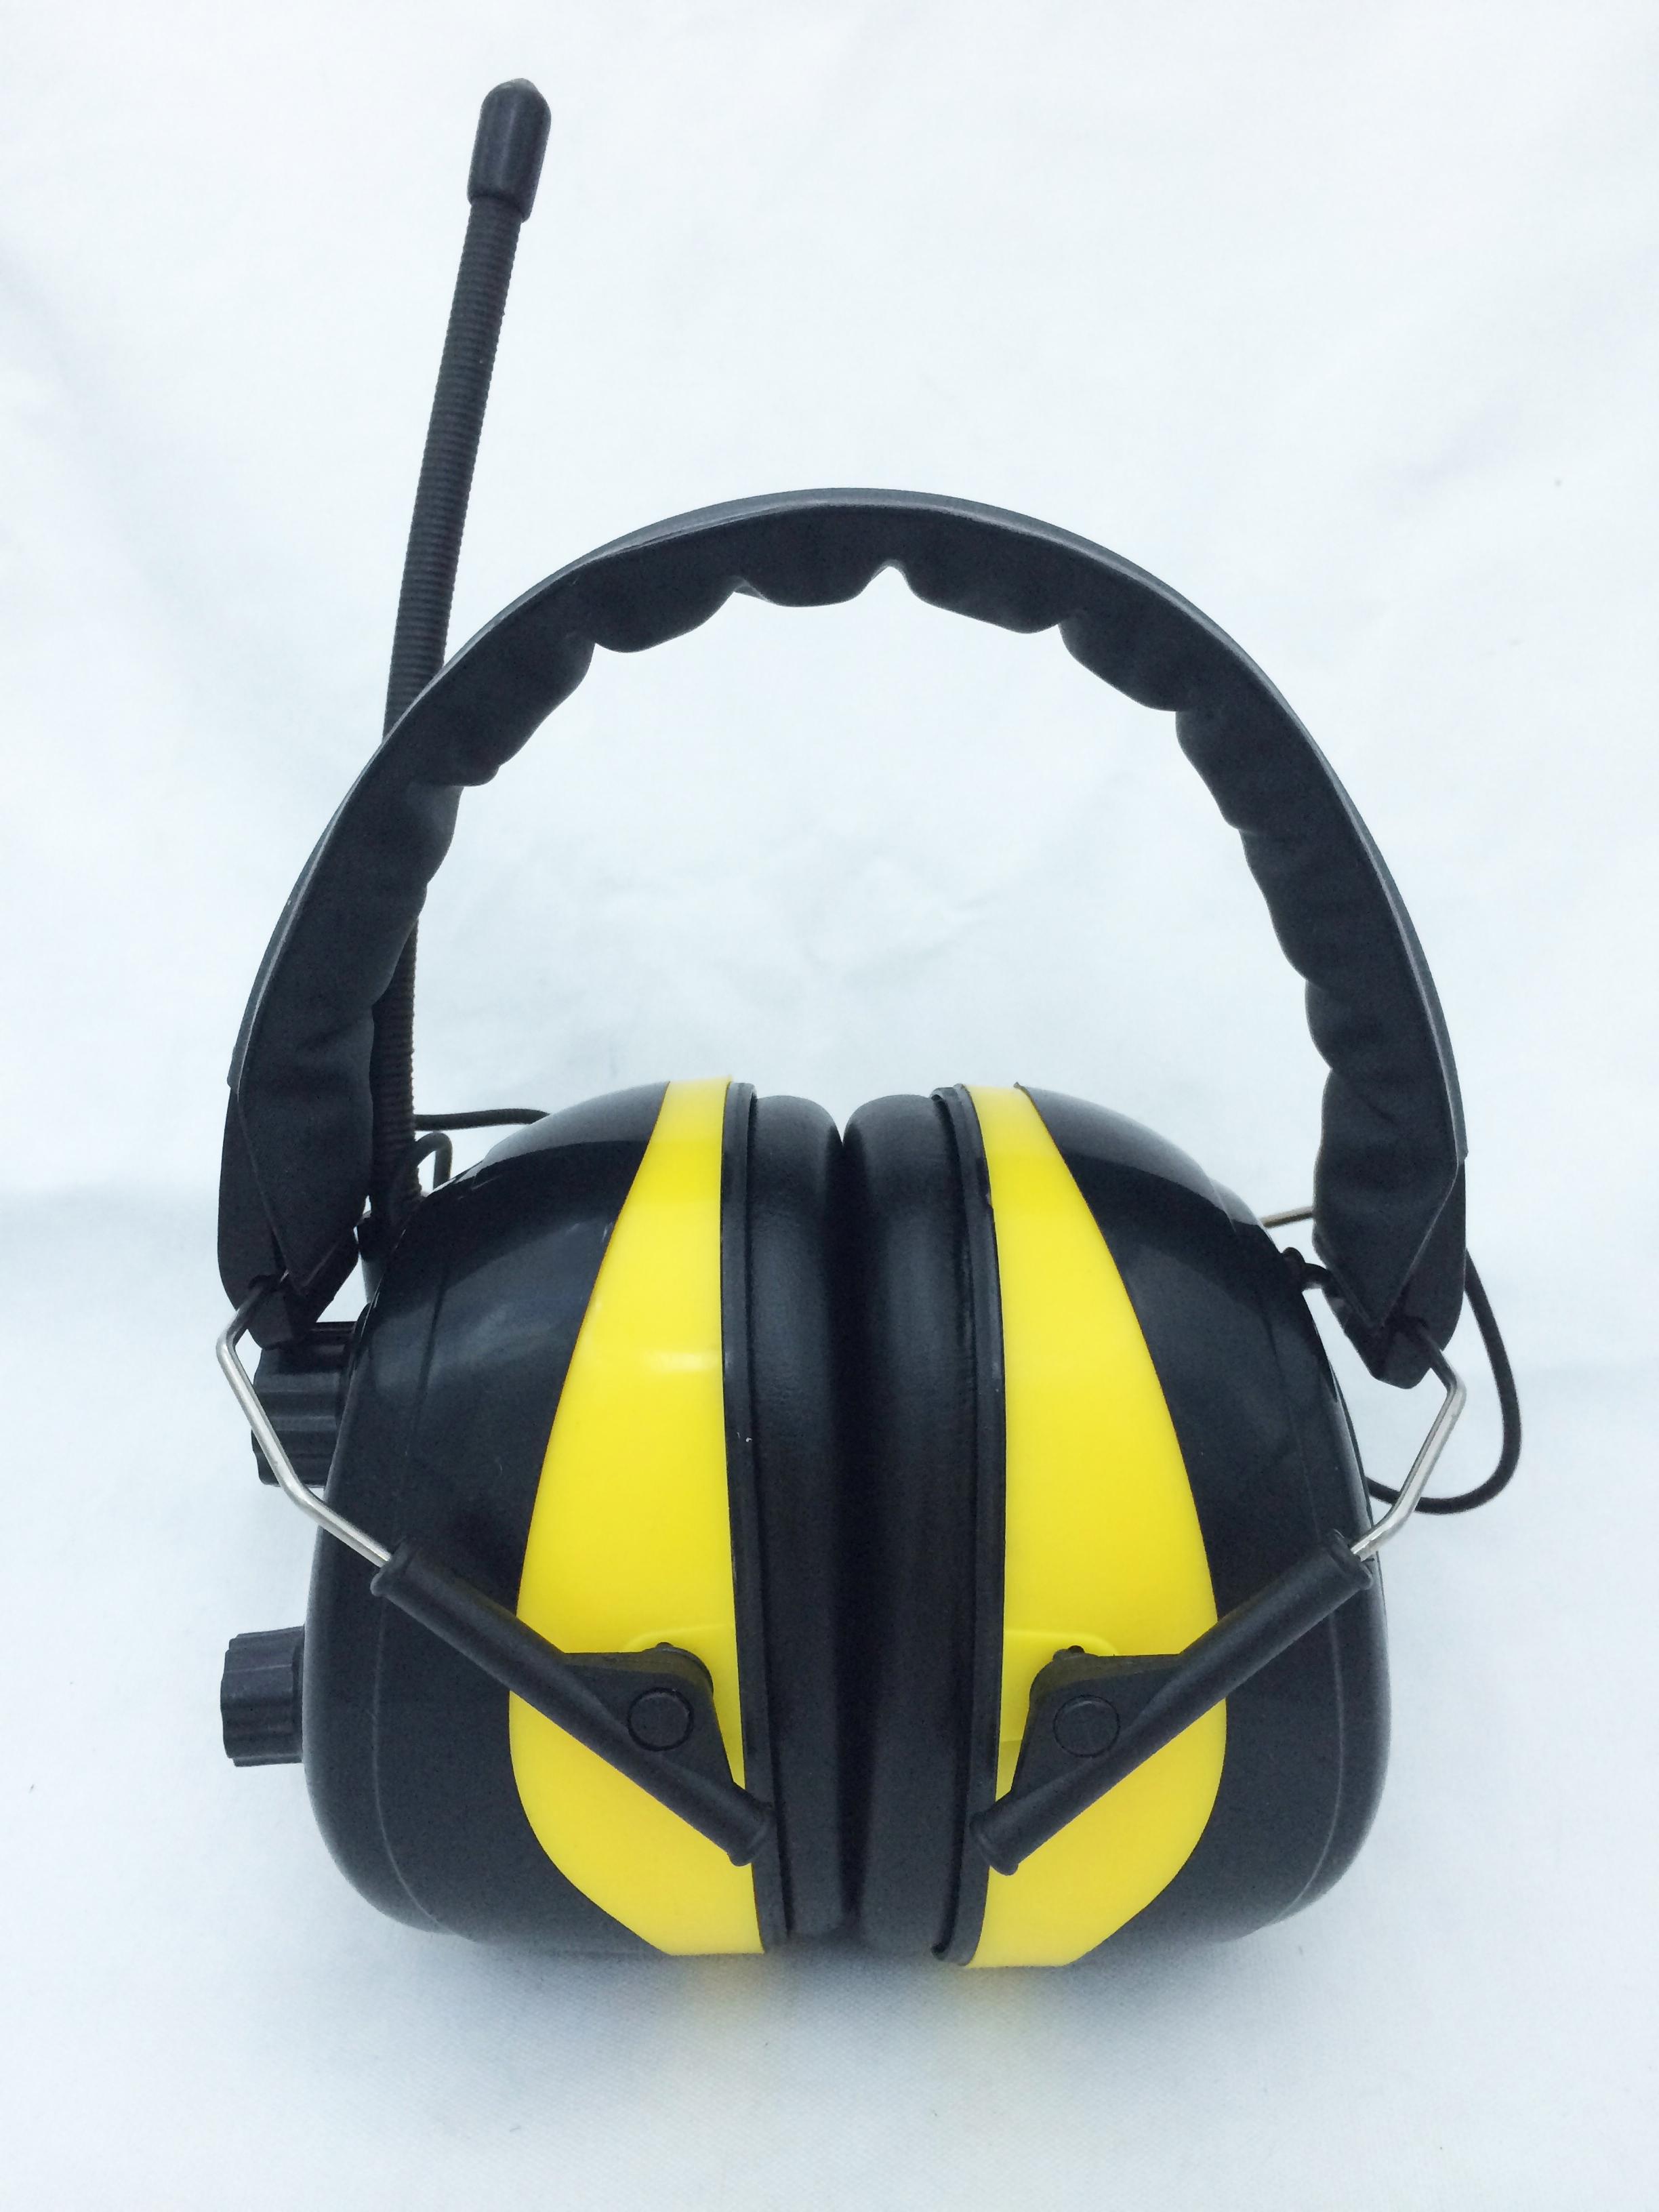 KALOAD Electronic Anti-noise Protection Ear Muffs Plus MP3 / AM / FM Function